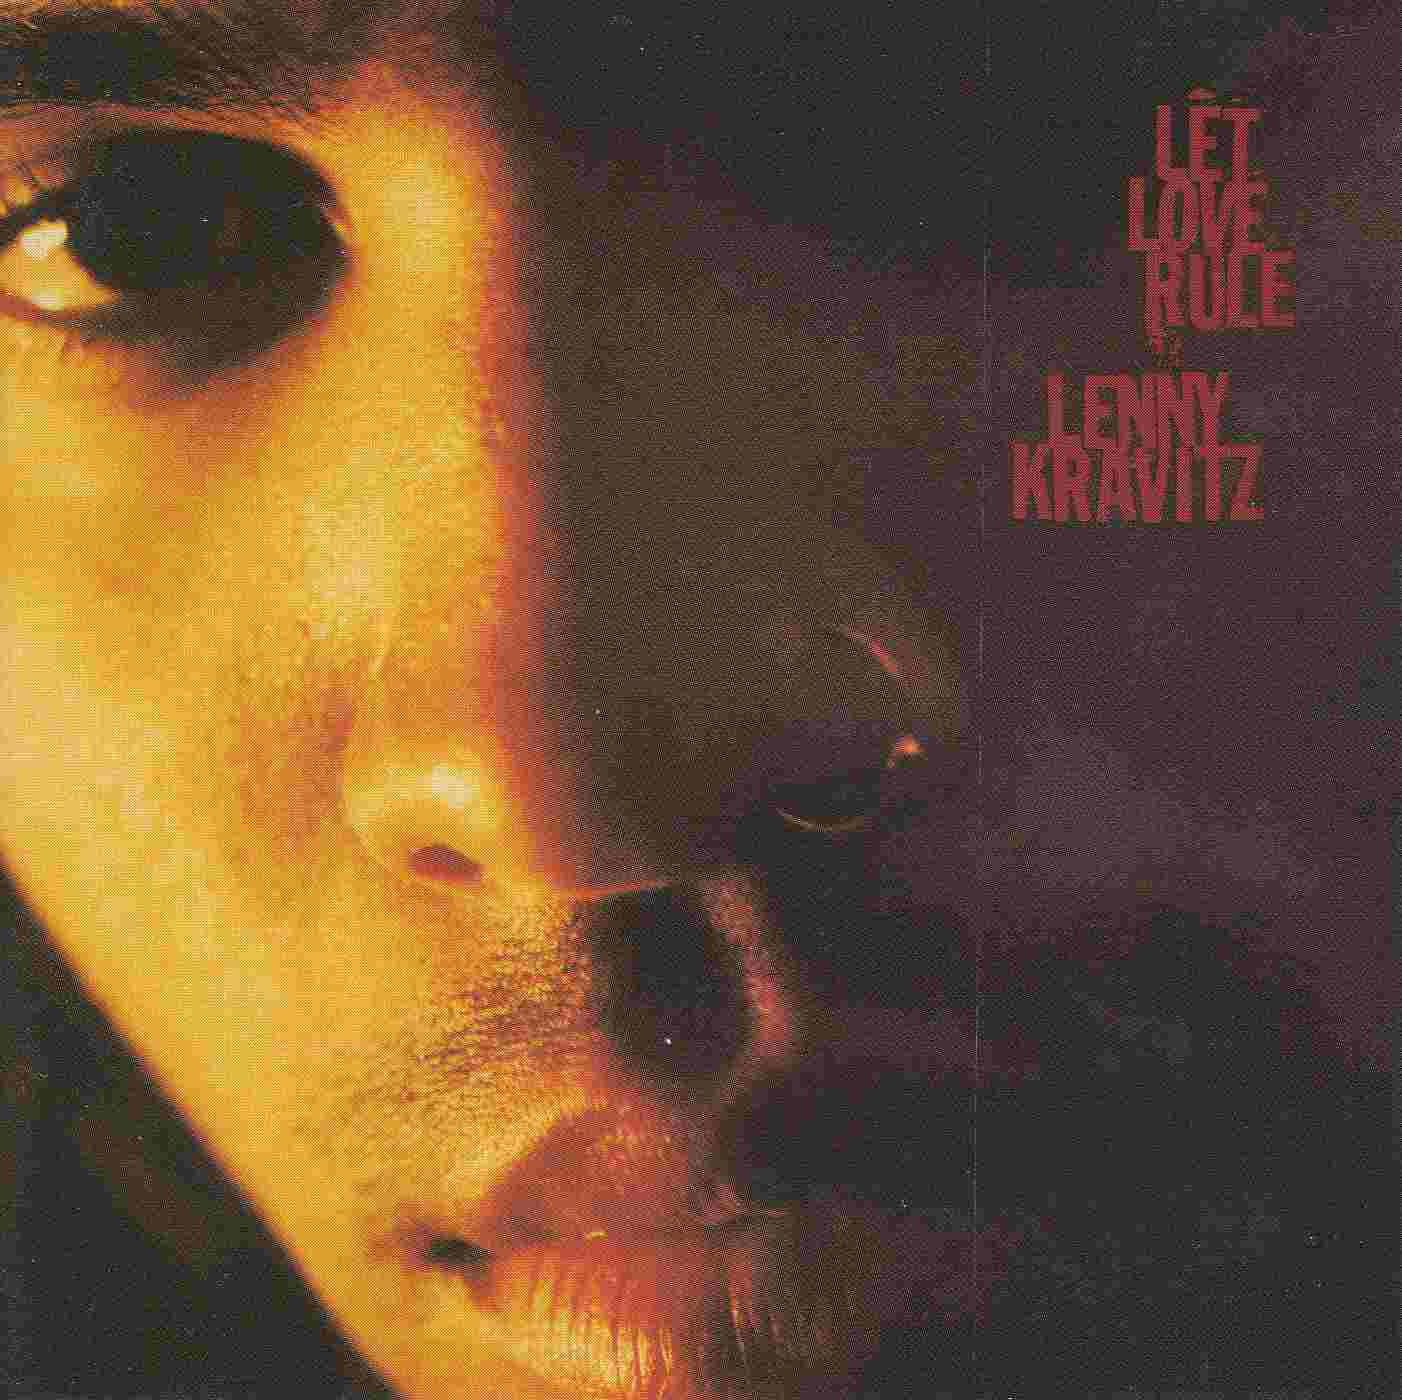 http://3.bp.blogspot.com/-AbS8ldutrdY/TdX8fg2hCFI/AAAAAAAAAC4/xzJ6WVEqEk8/s1600/Lenny+Kravitz+-+Let+Love+Rule+%252820th+Anniversary+Deluxe+Edition%2529.jpg